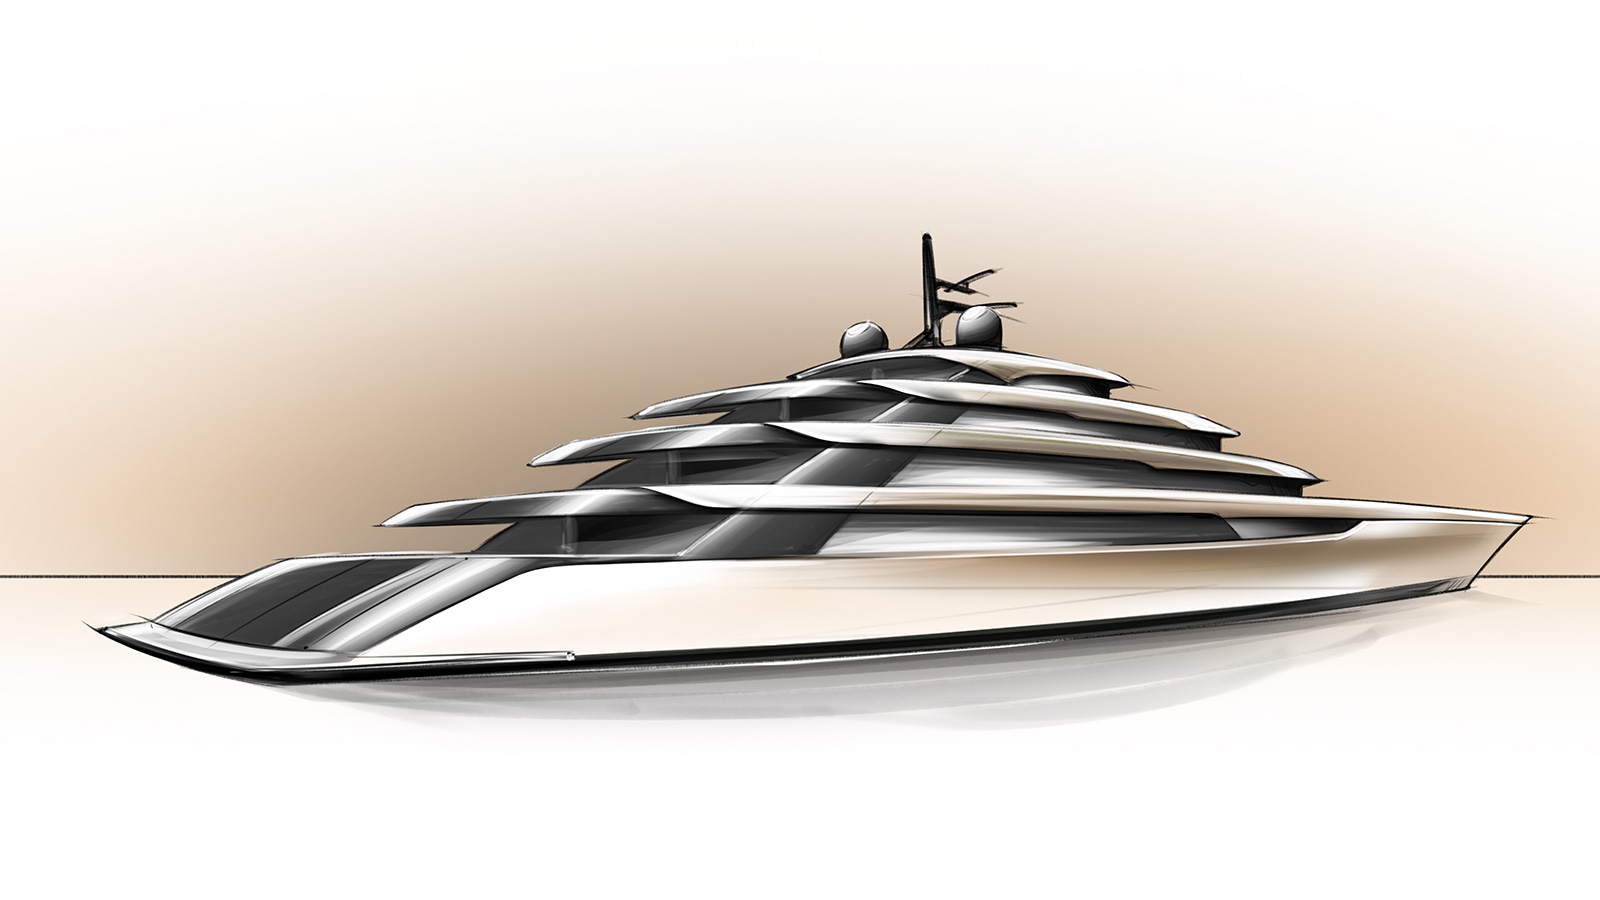 Mulder 115m Concept Yacht